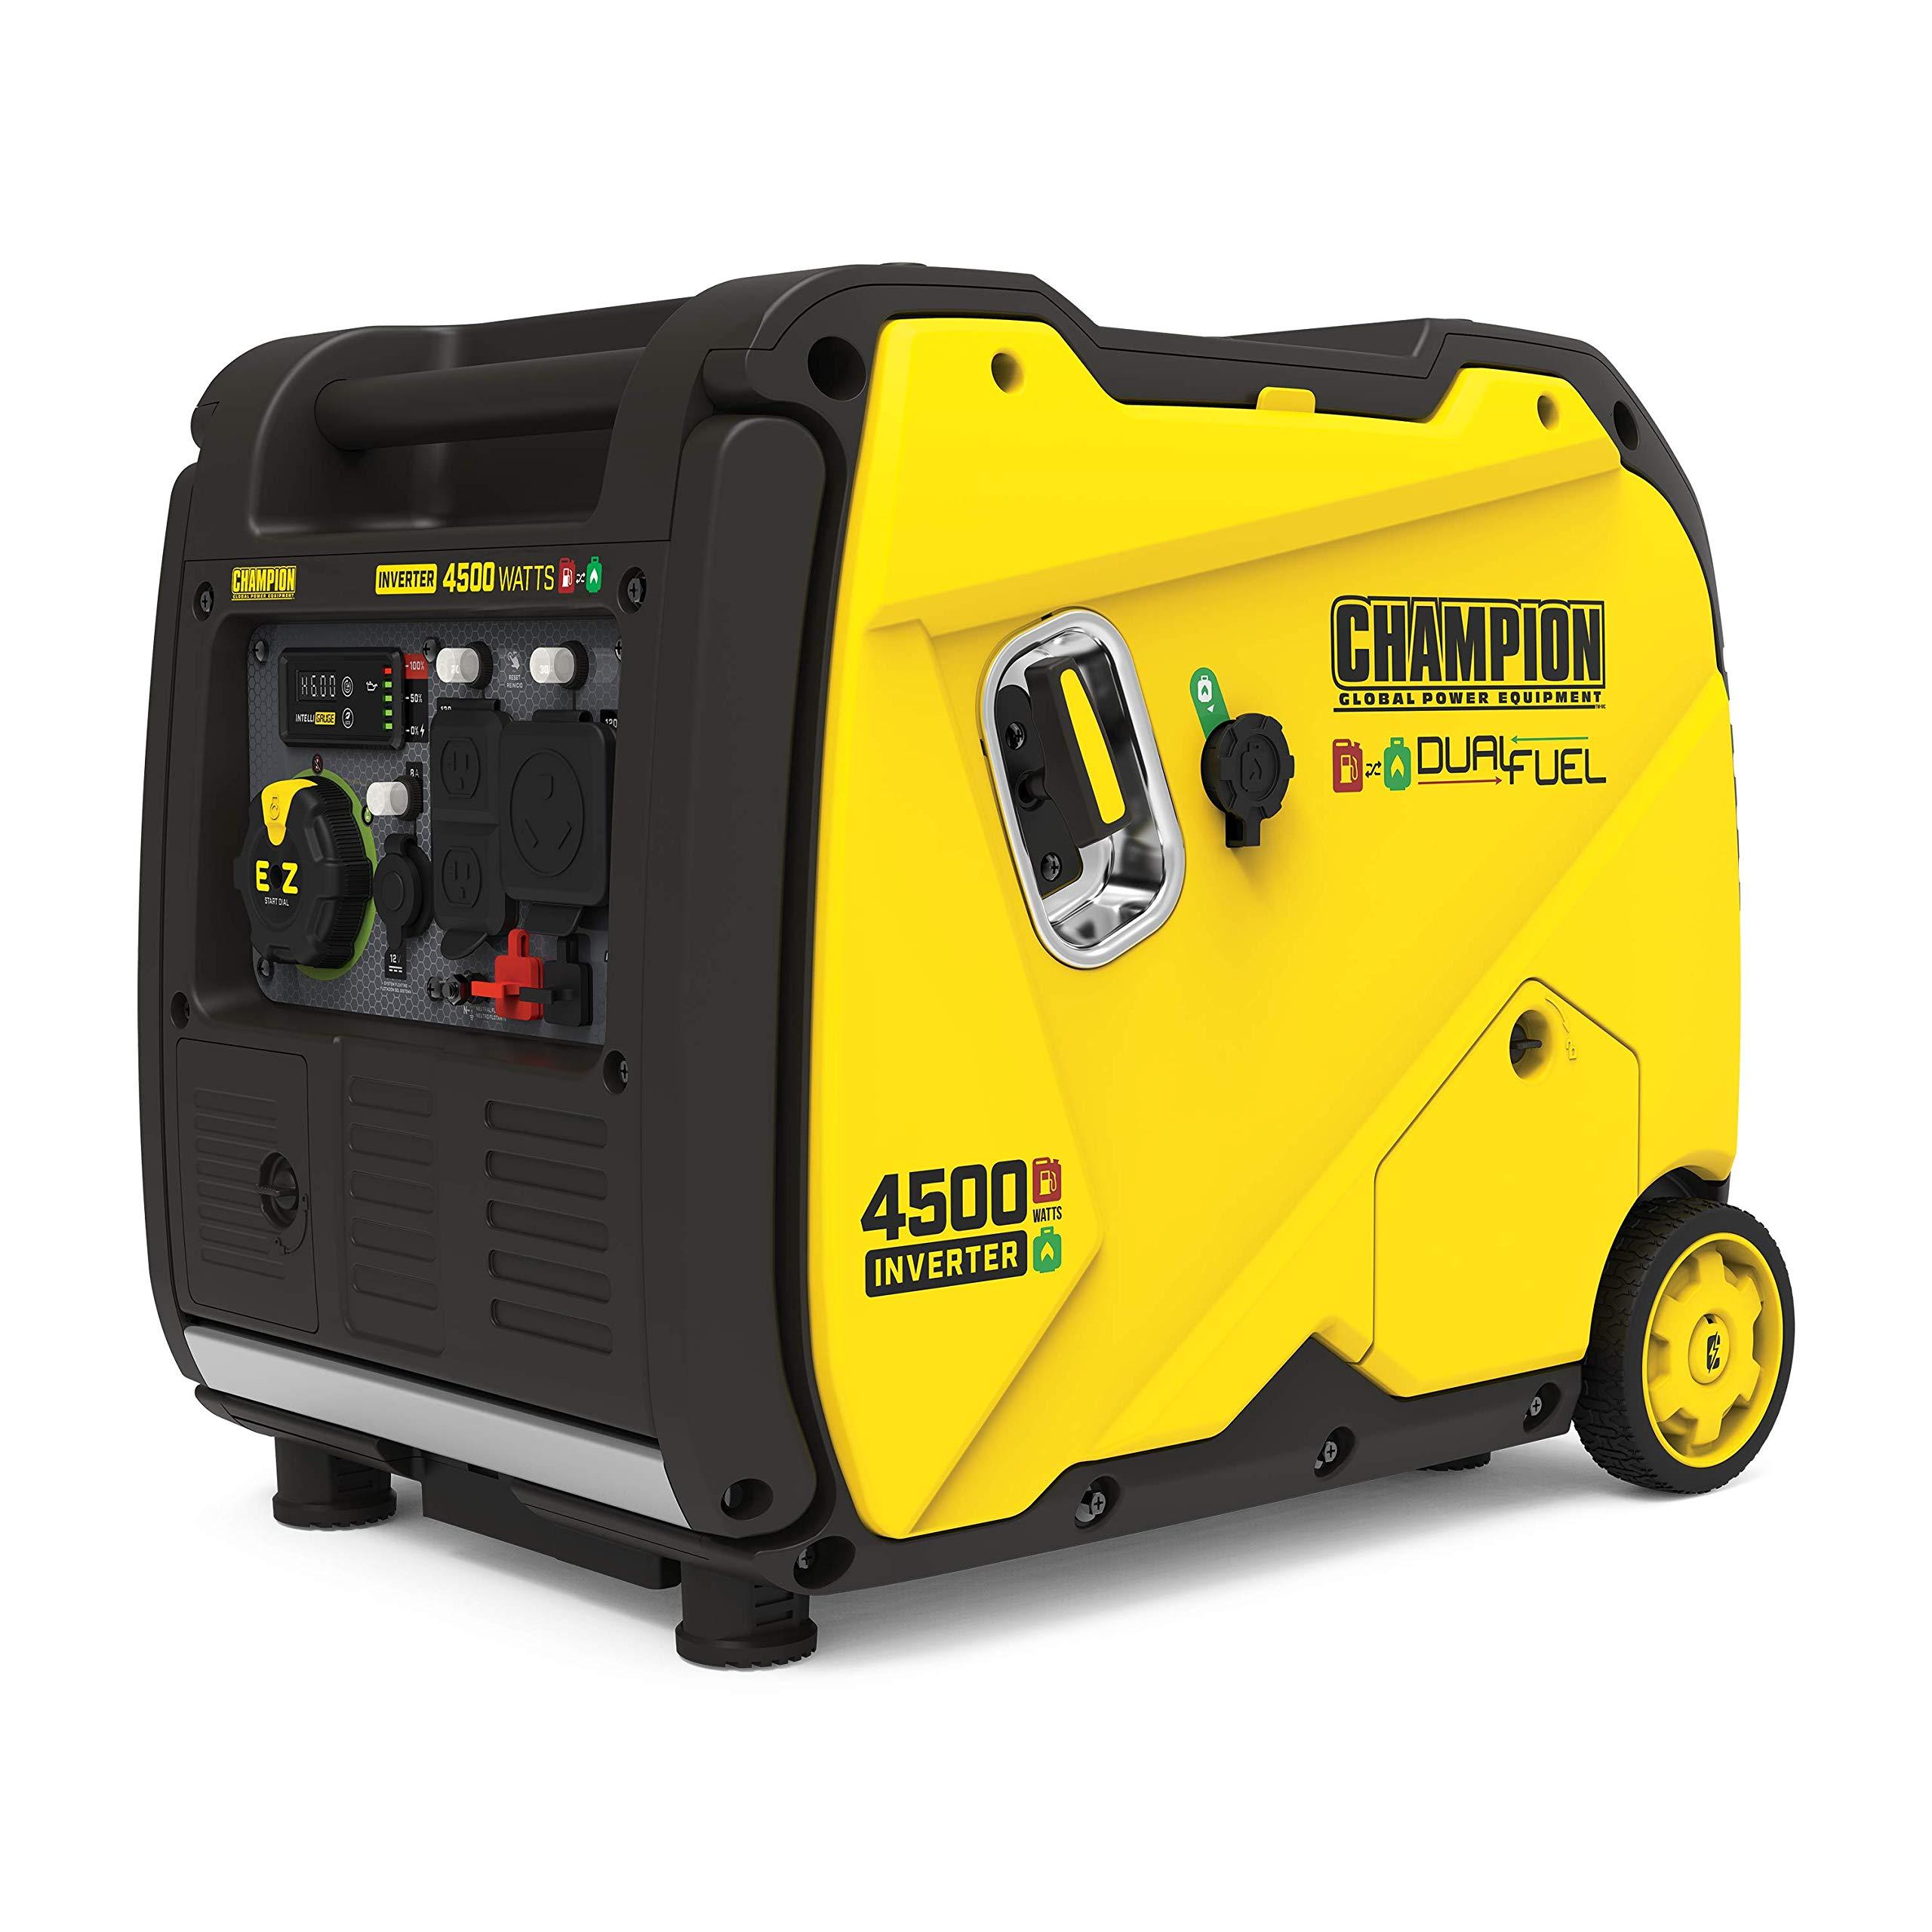 Champion Power Equipment 200988 4500-Watt Dual Fuel Portable Inverter Generator, Electric Start $816.20 + Free Shipping